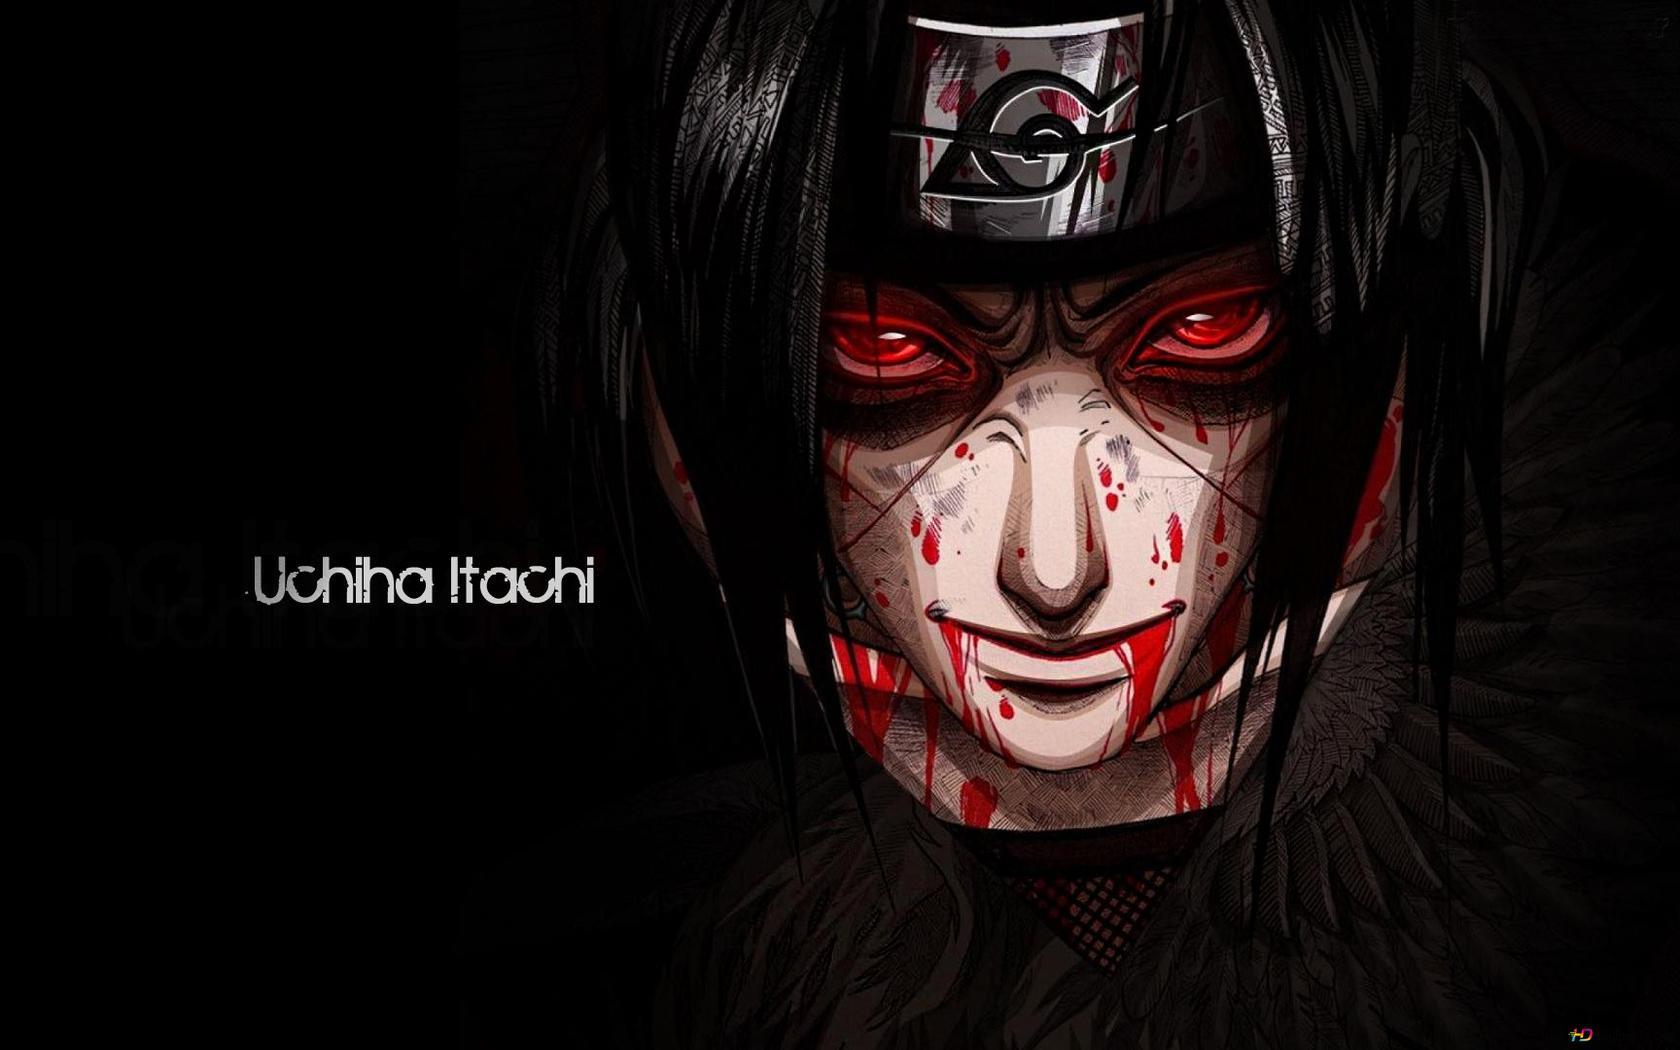 Naruto Shippuden Itachi Uchiha Hd Hintergrundbilder